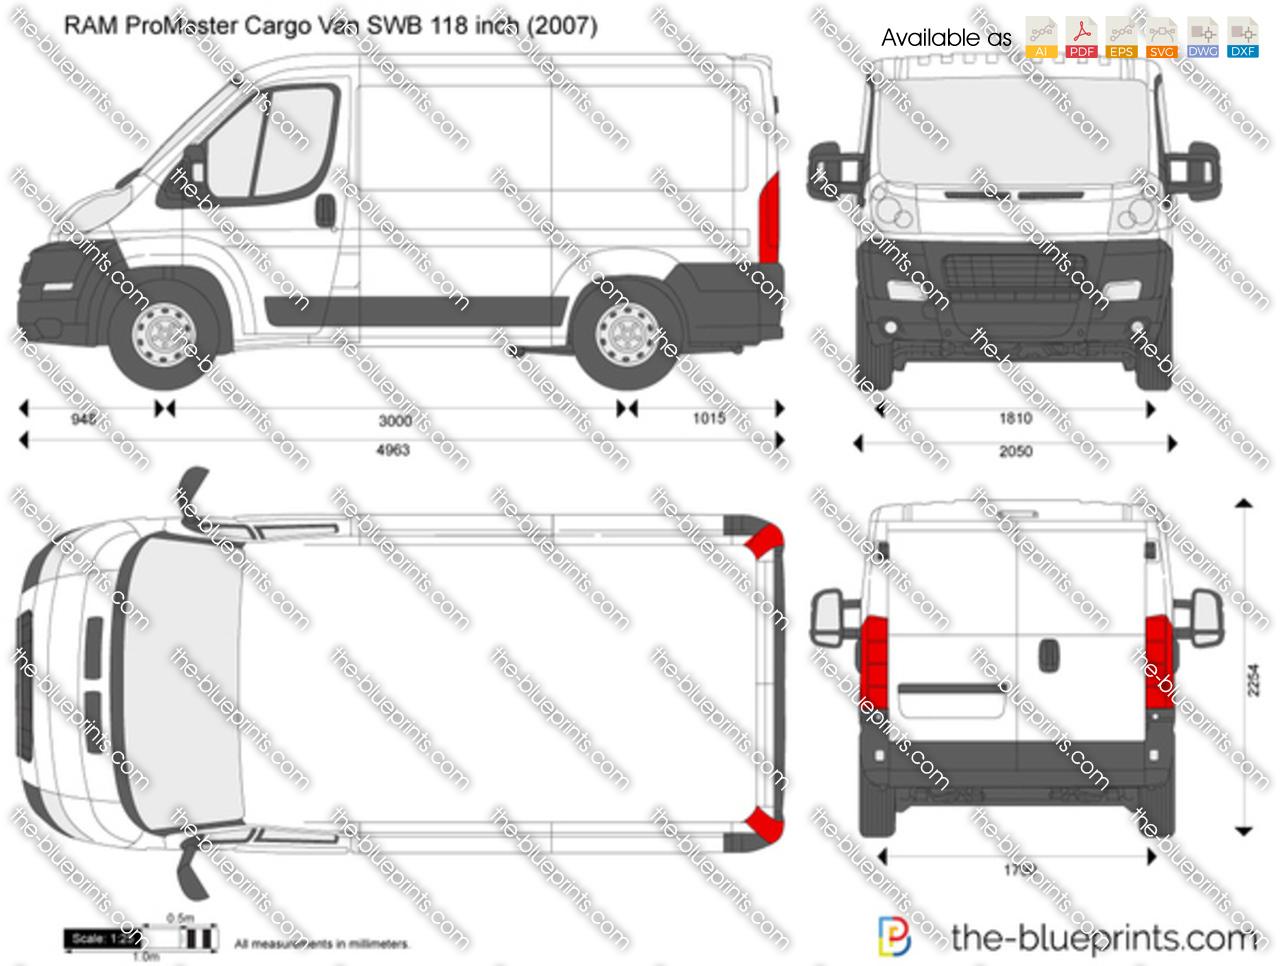 ... 2017 RAM ProMaster Cargo Van SWB 118 Inch ...